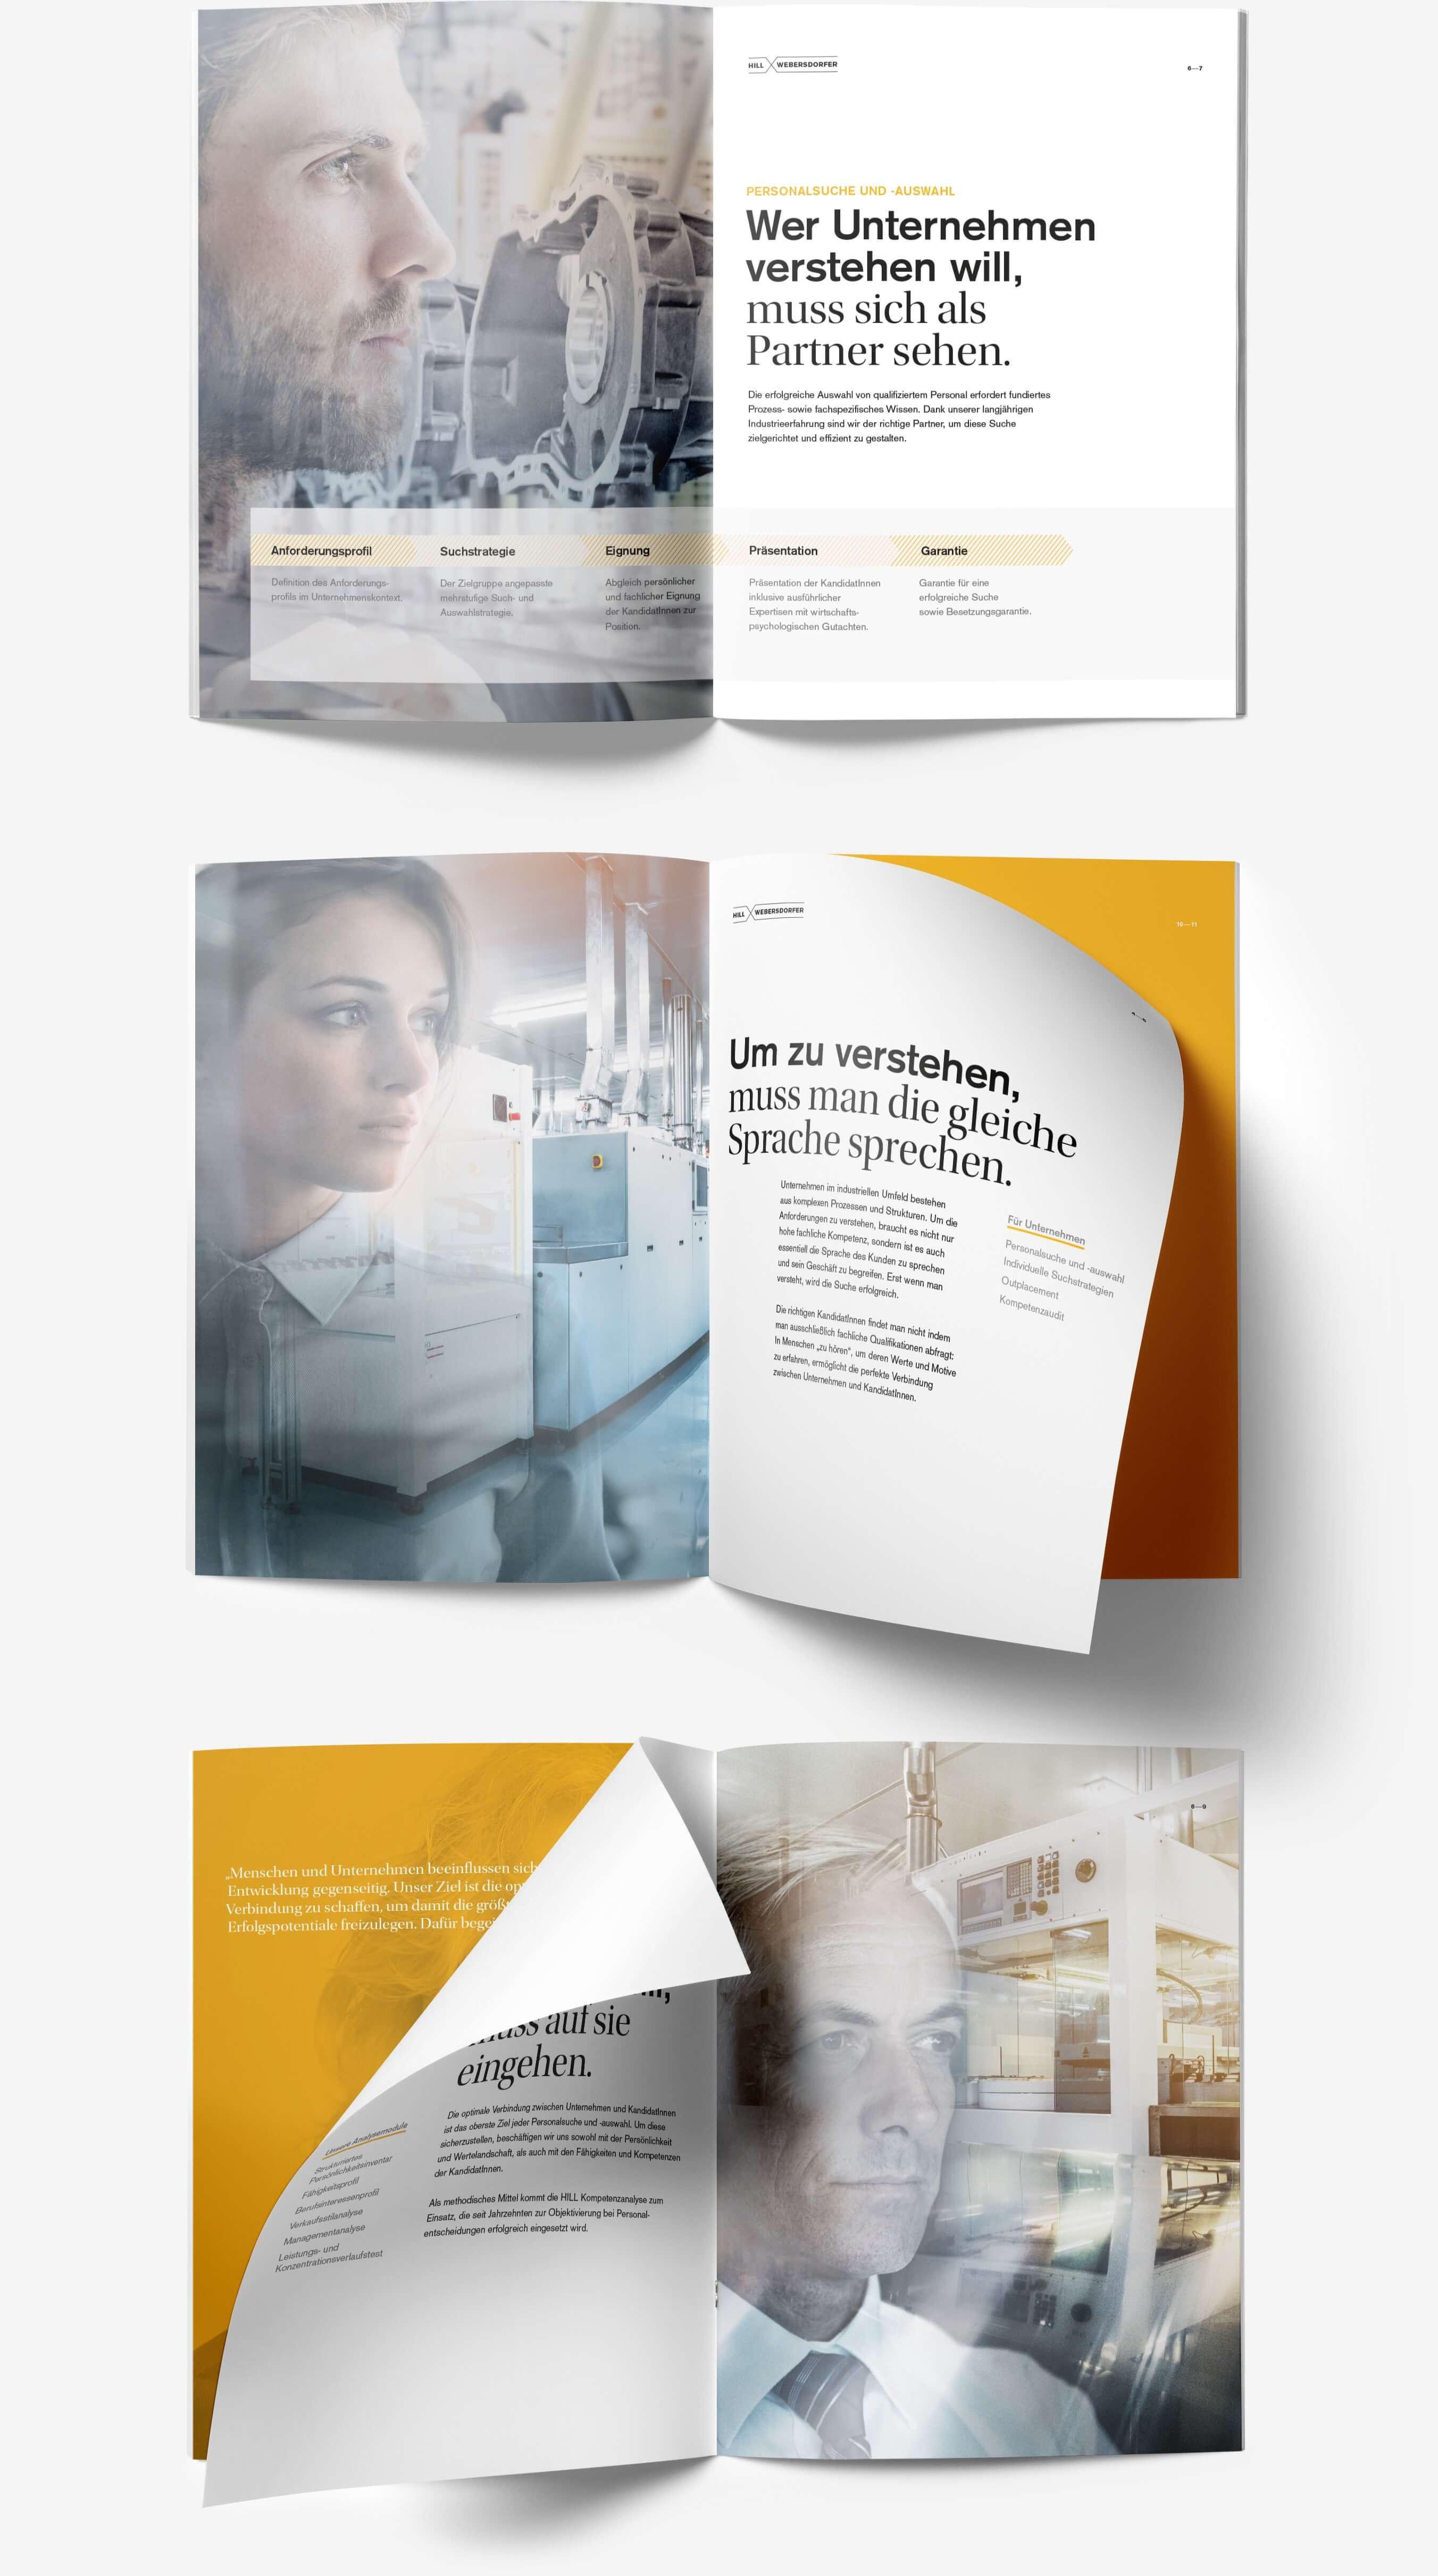 Q2 Werbeagentur, Hill, Print